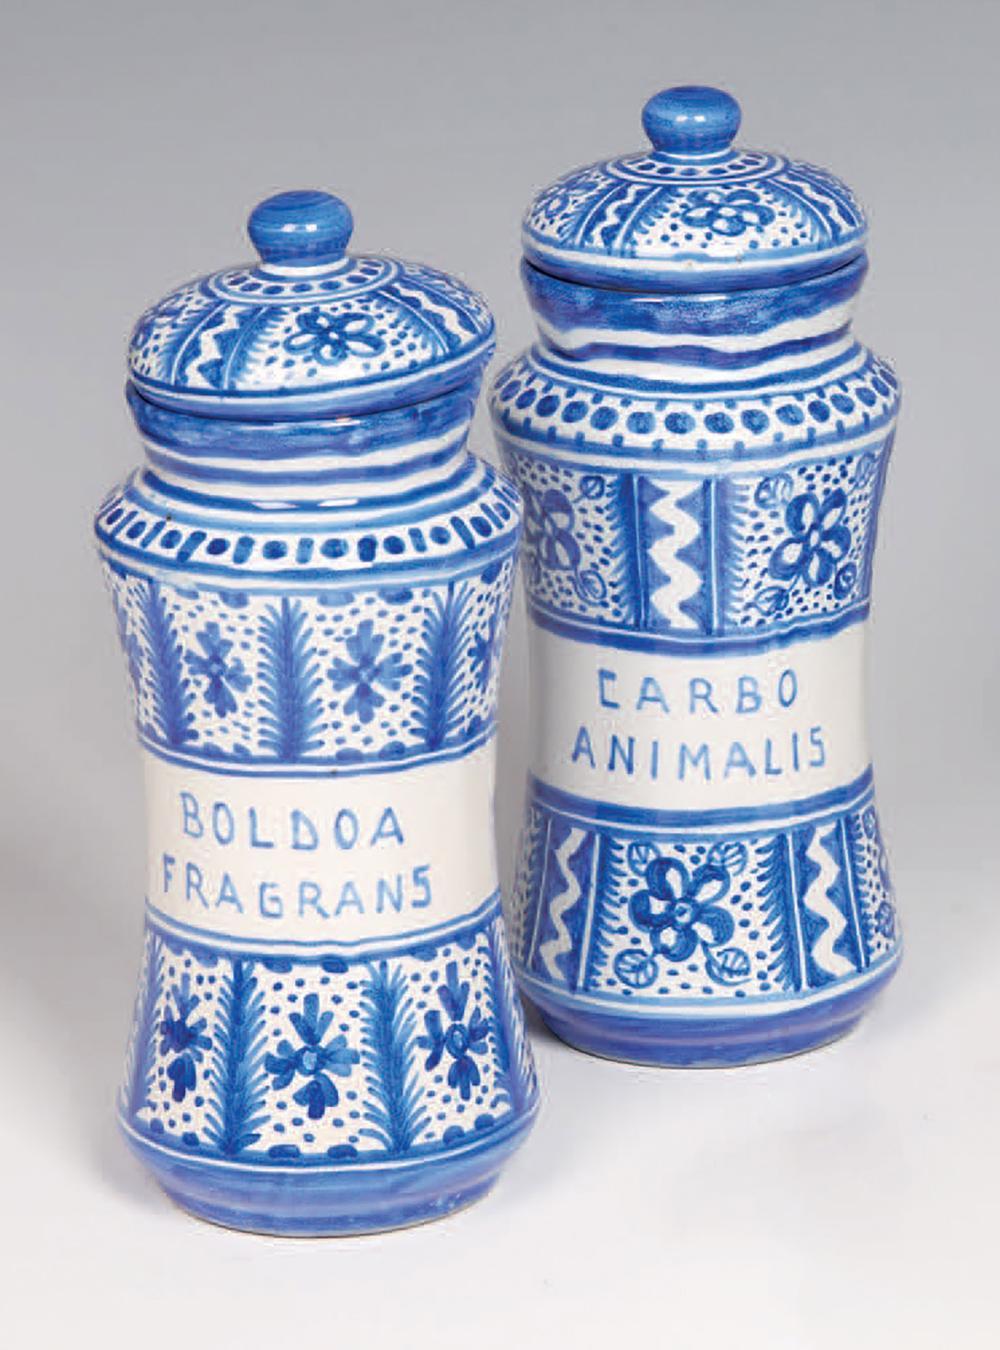 Coppia di vasi da farmacia con coperchi in ceramica bianca e blu Pair of covered medicine jars in white and blue ceramic